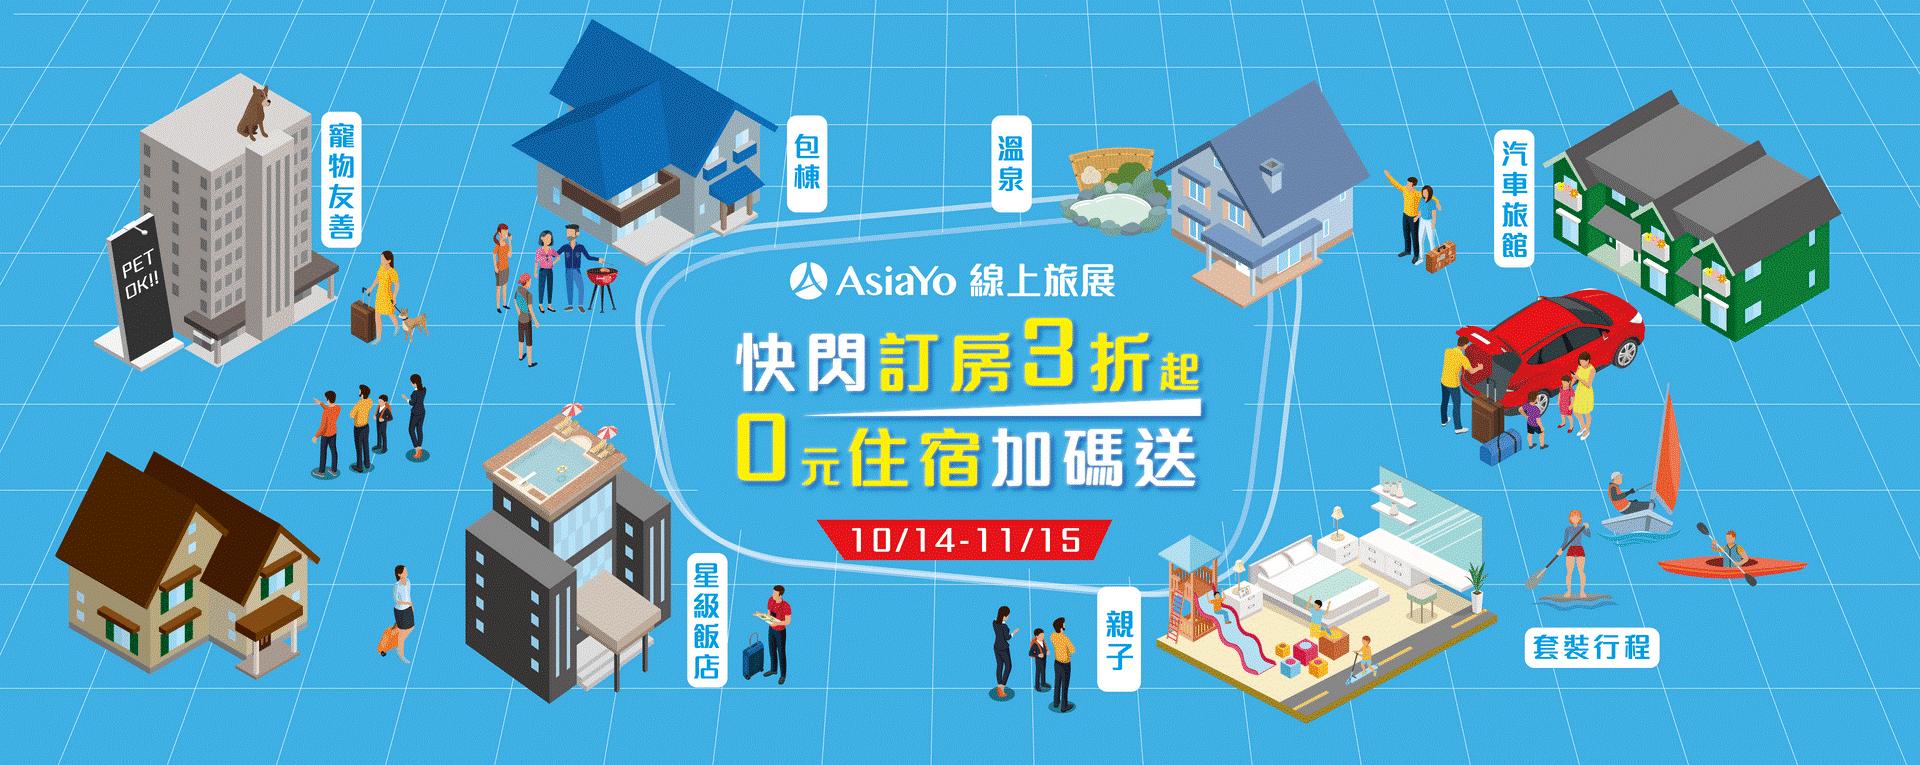 【2020 AsiaYo 線上旅展】年終最狂!全台飯店、民宿3折起,再抽0元爽住飯店!